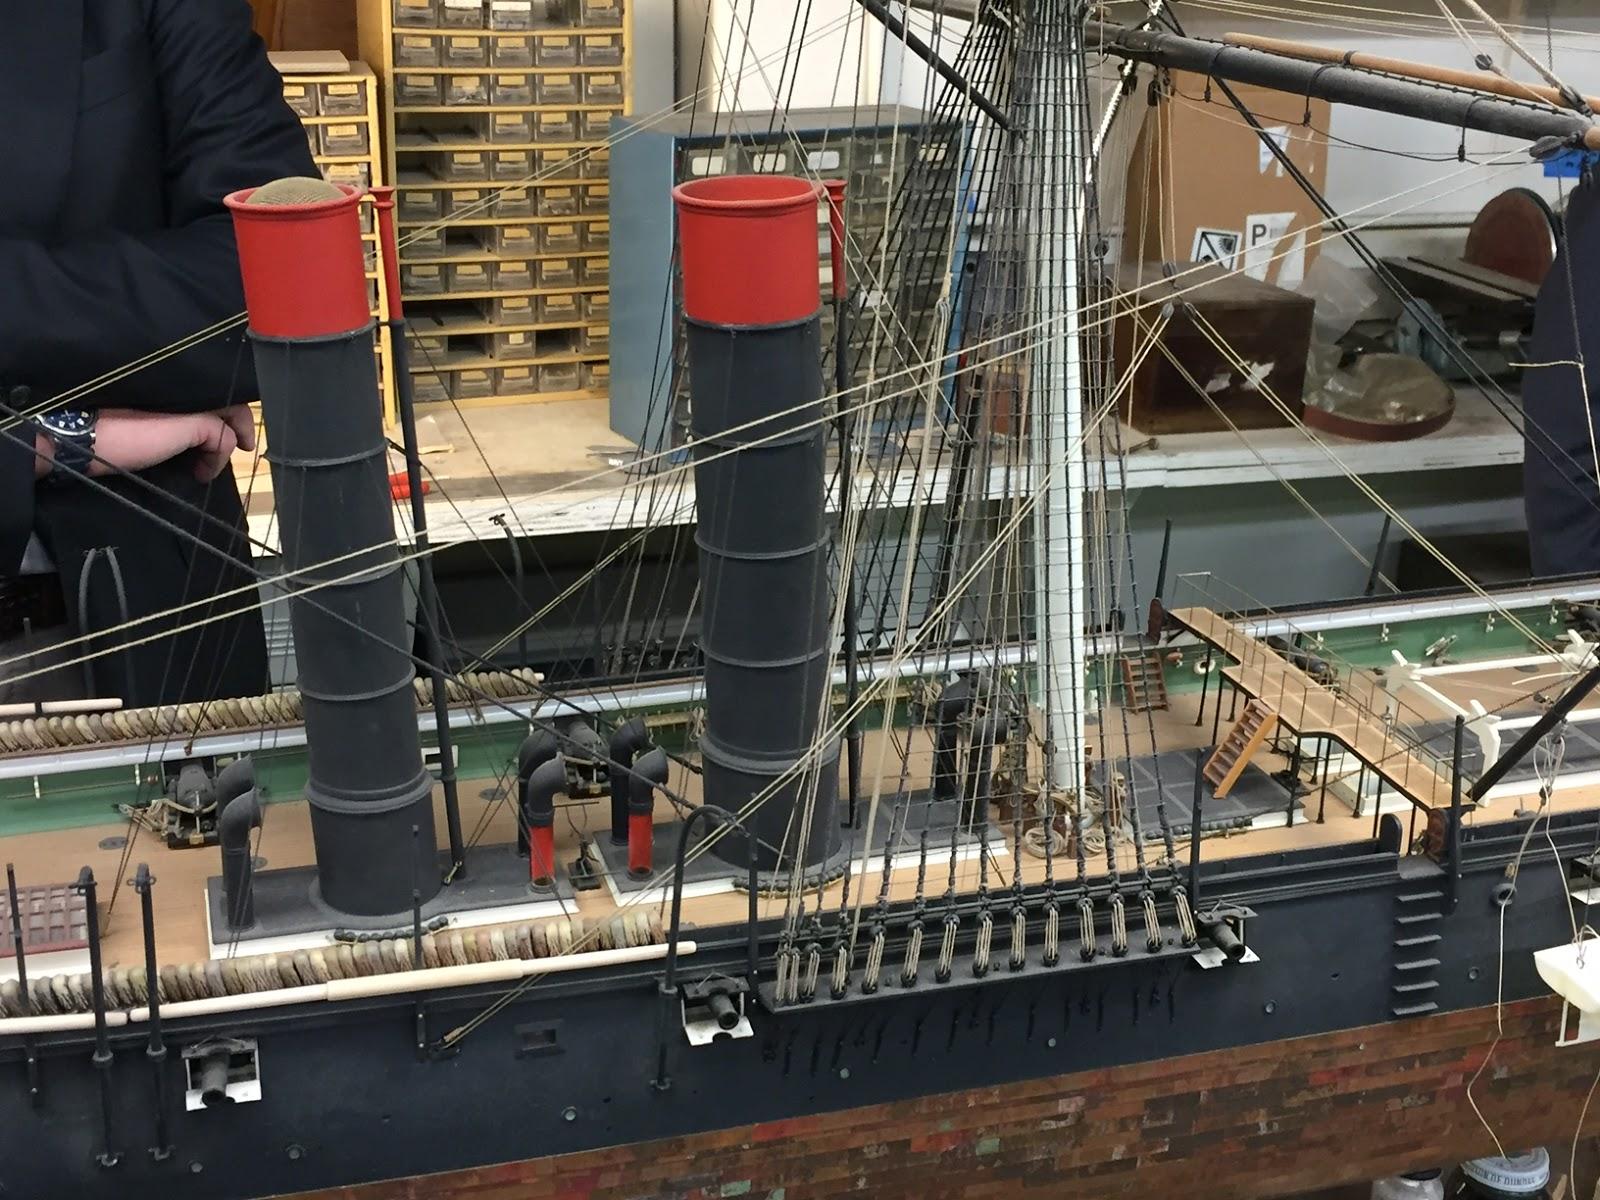 real economics: HAWB 1863 - Admiral Benjamin Franklin